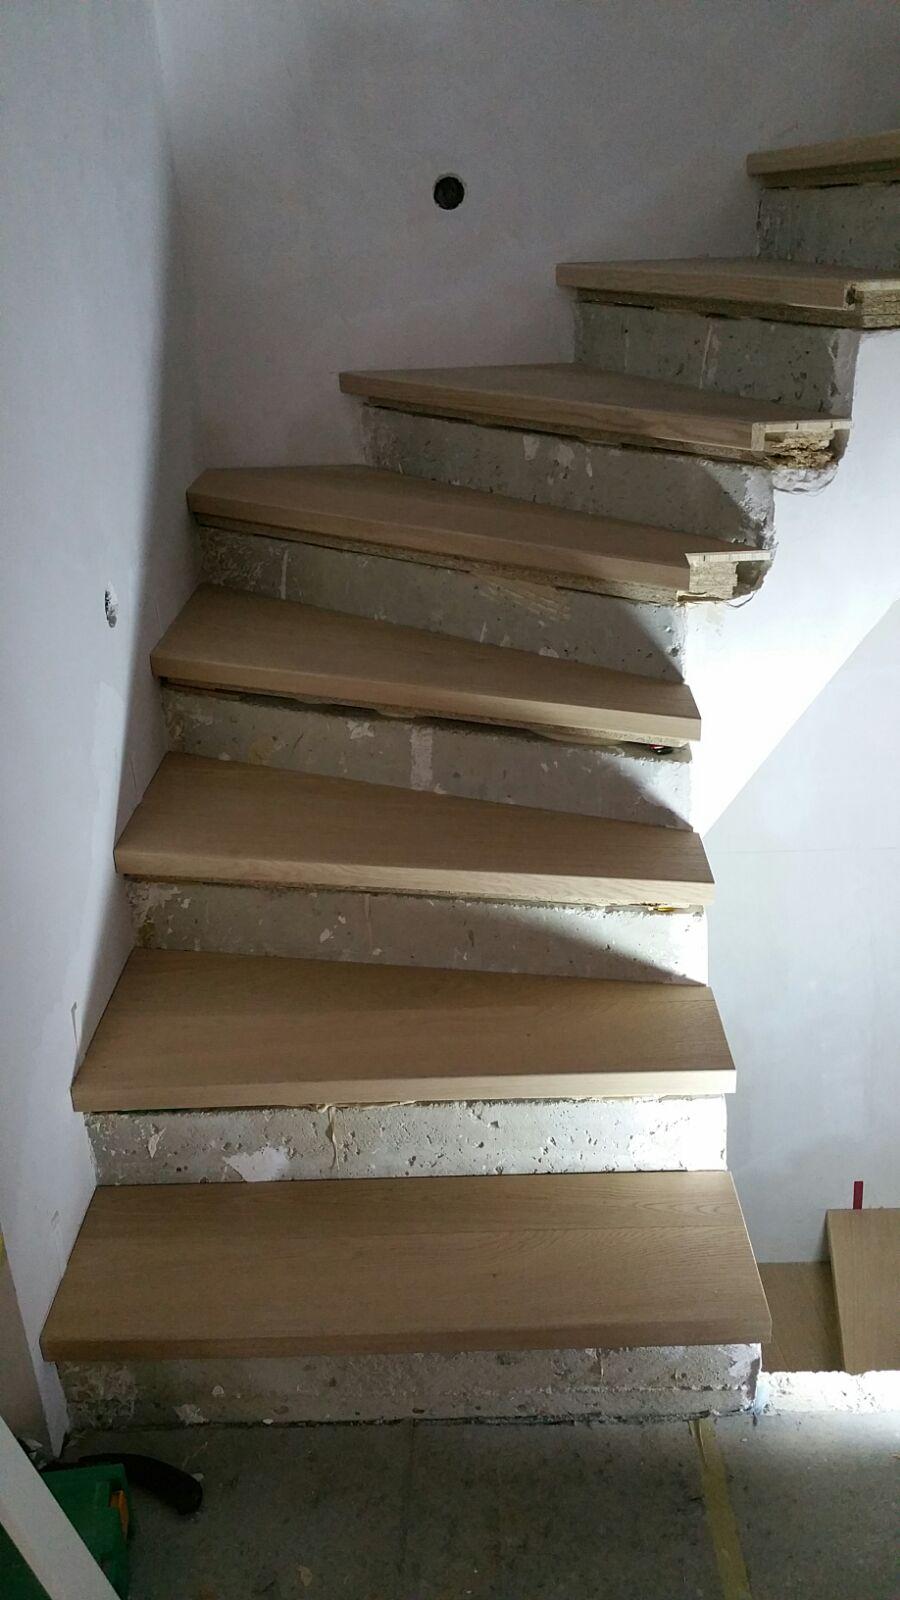 Holztreppe auf Betonboden